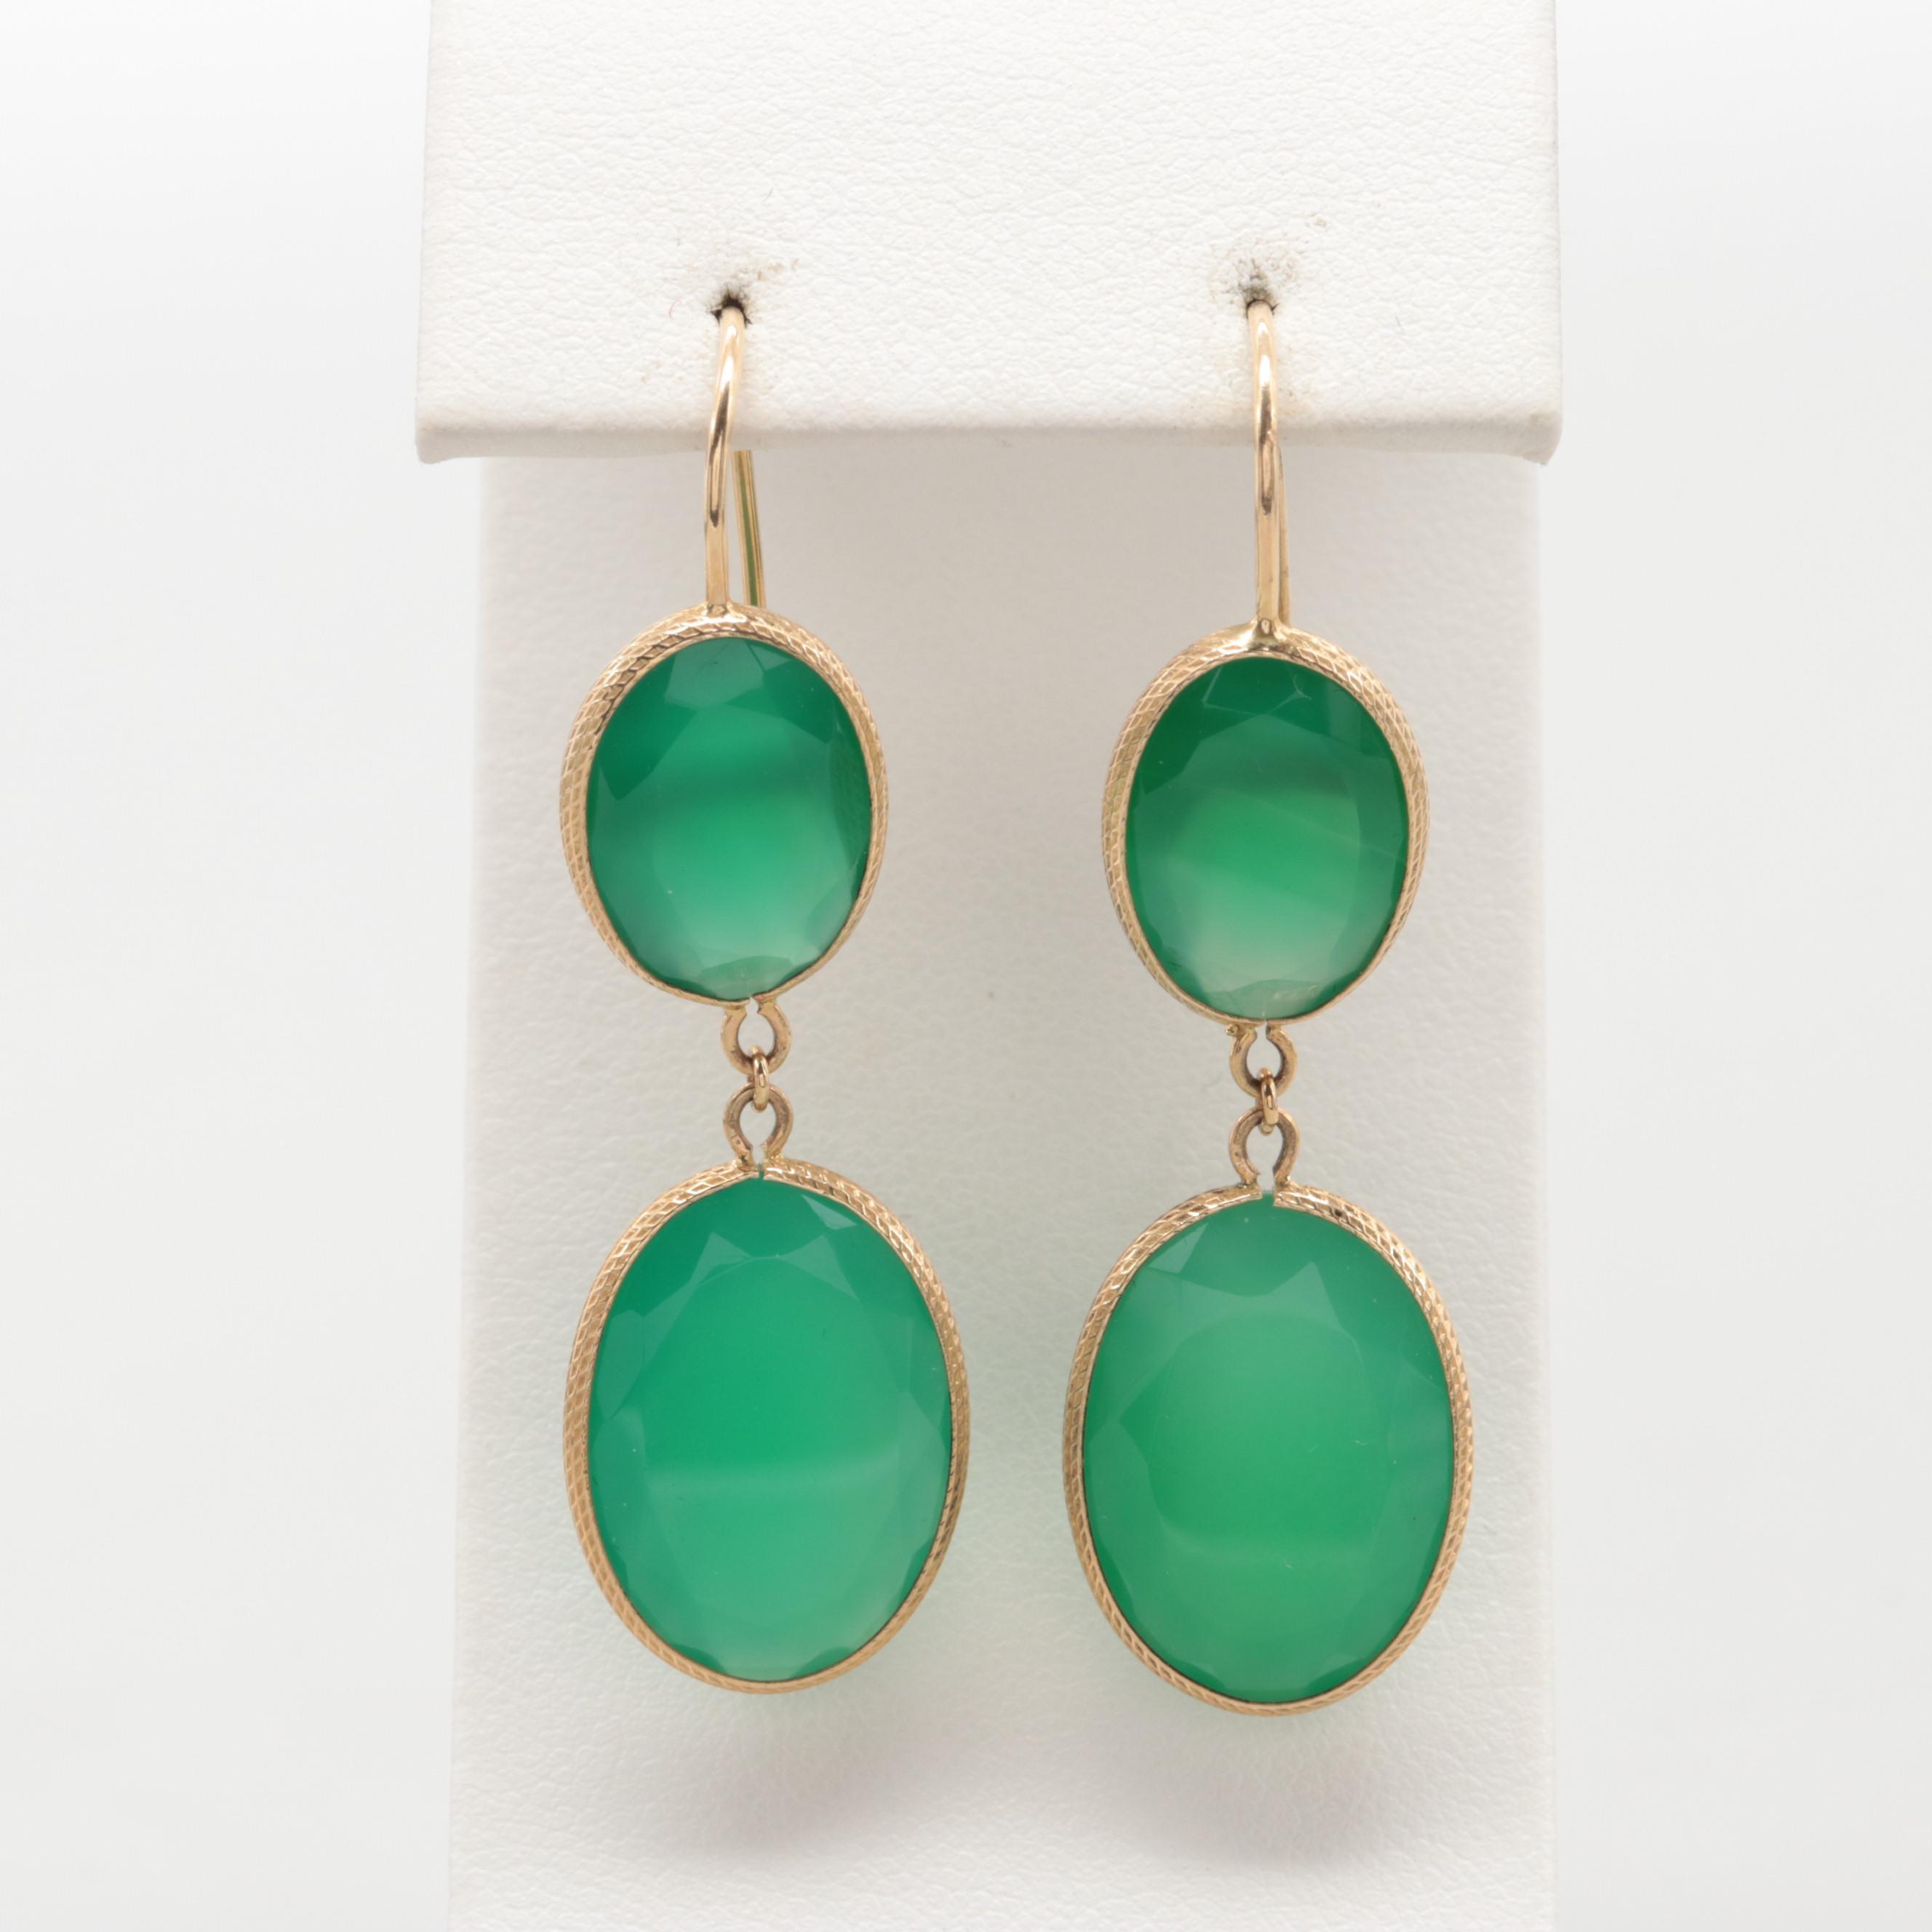 14K Yellow Gold Green Chalcedony Dangle Drop Earrings